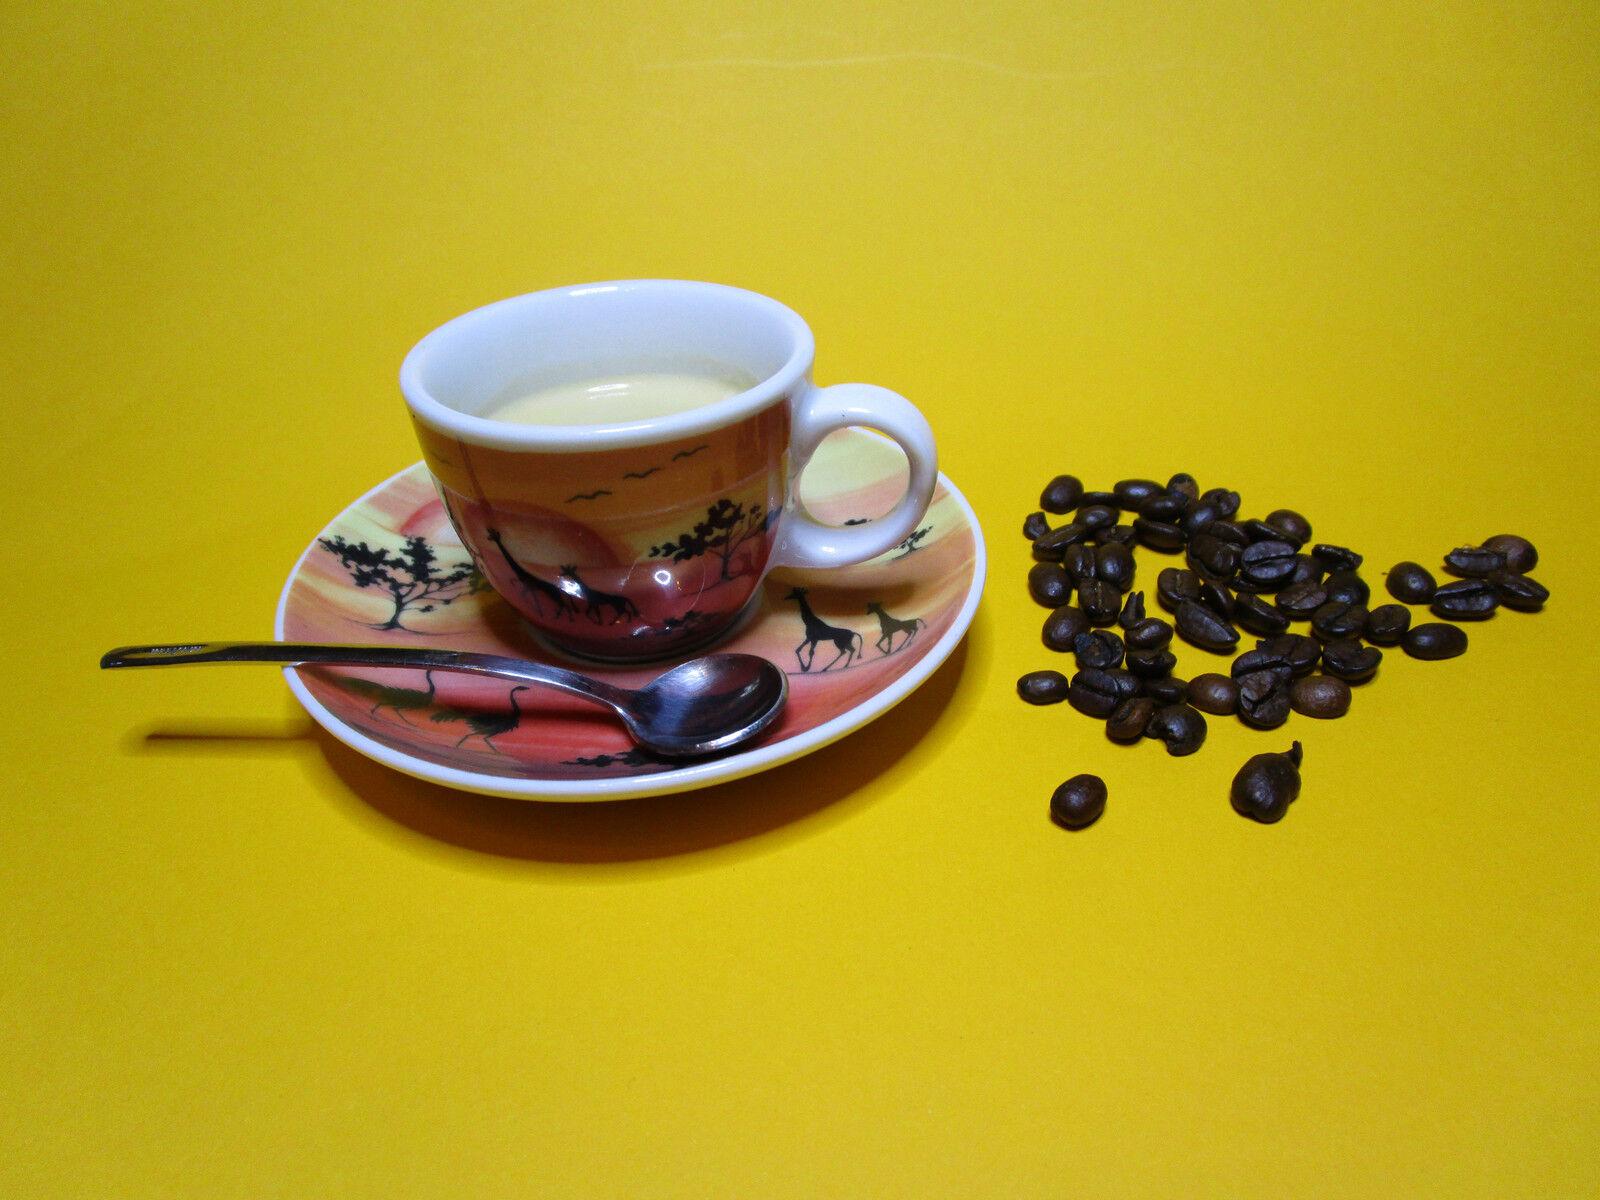 kaffegenuss, Martin Hermenau